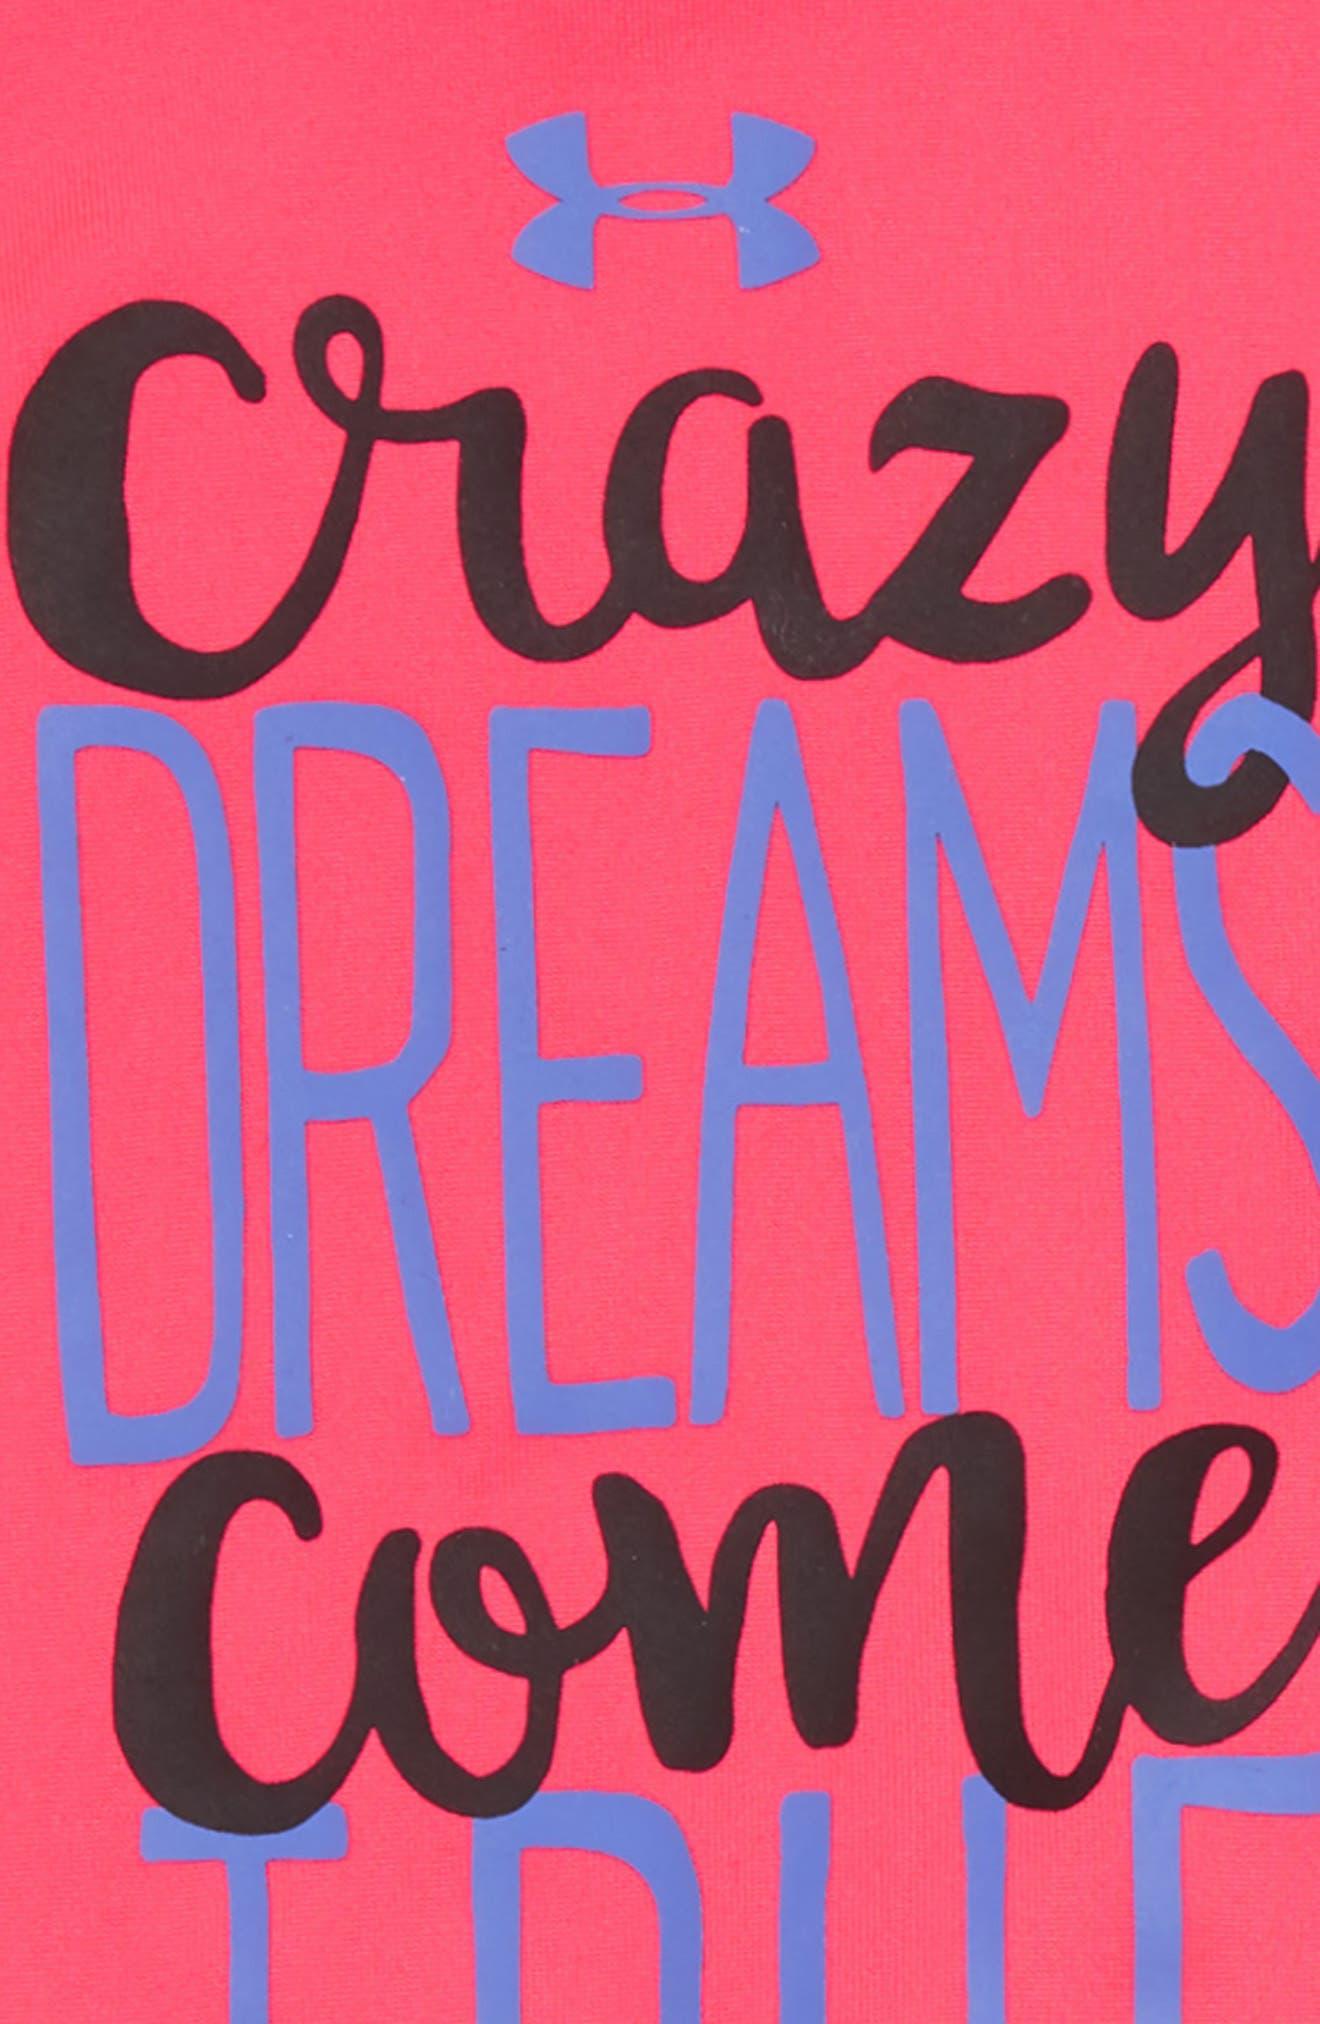 Crazy Dreams Come True Tee & Leggings Set,                             Alternate thumbnail 2, color,                             PENTA PINK